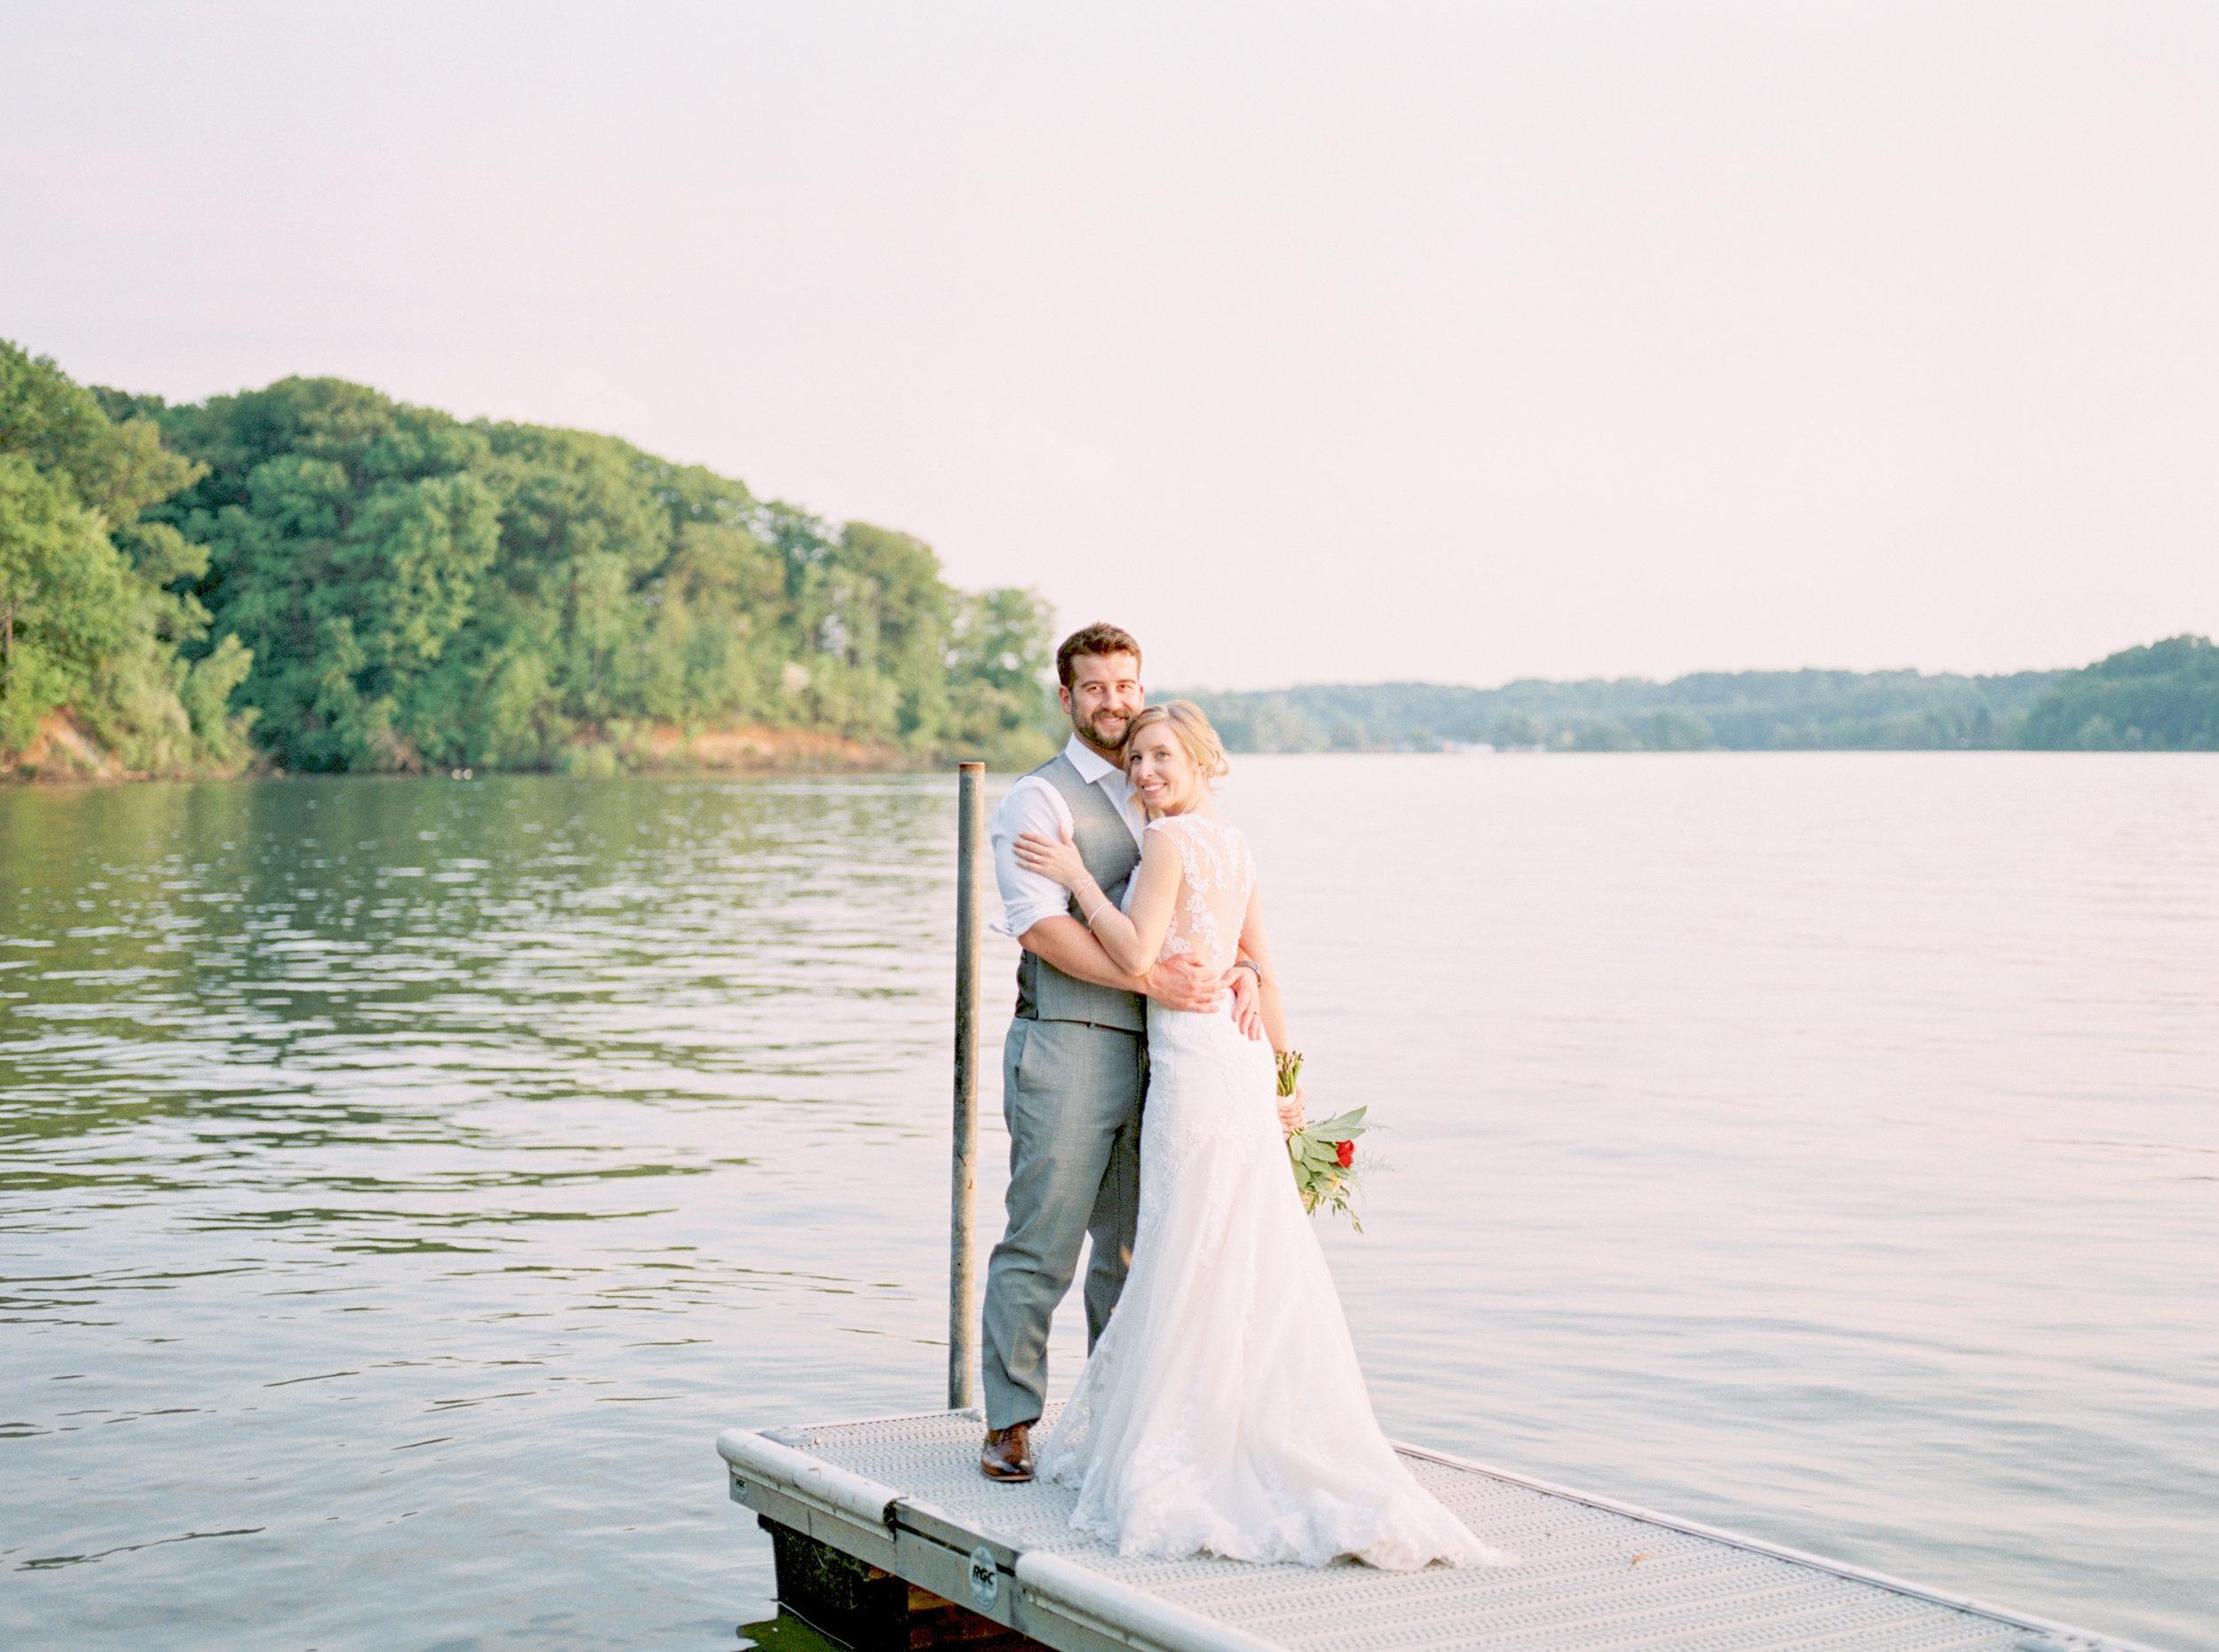 Brittany & Joe Wedding Photography